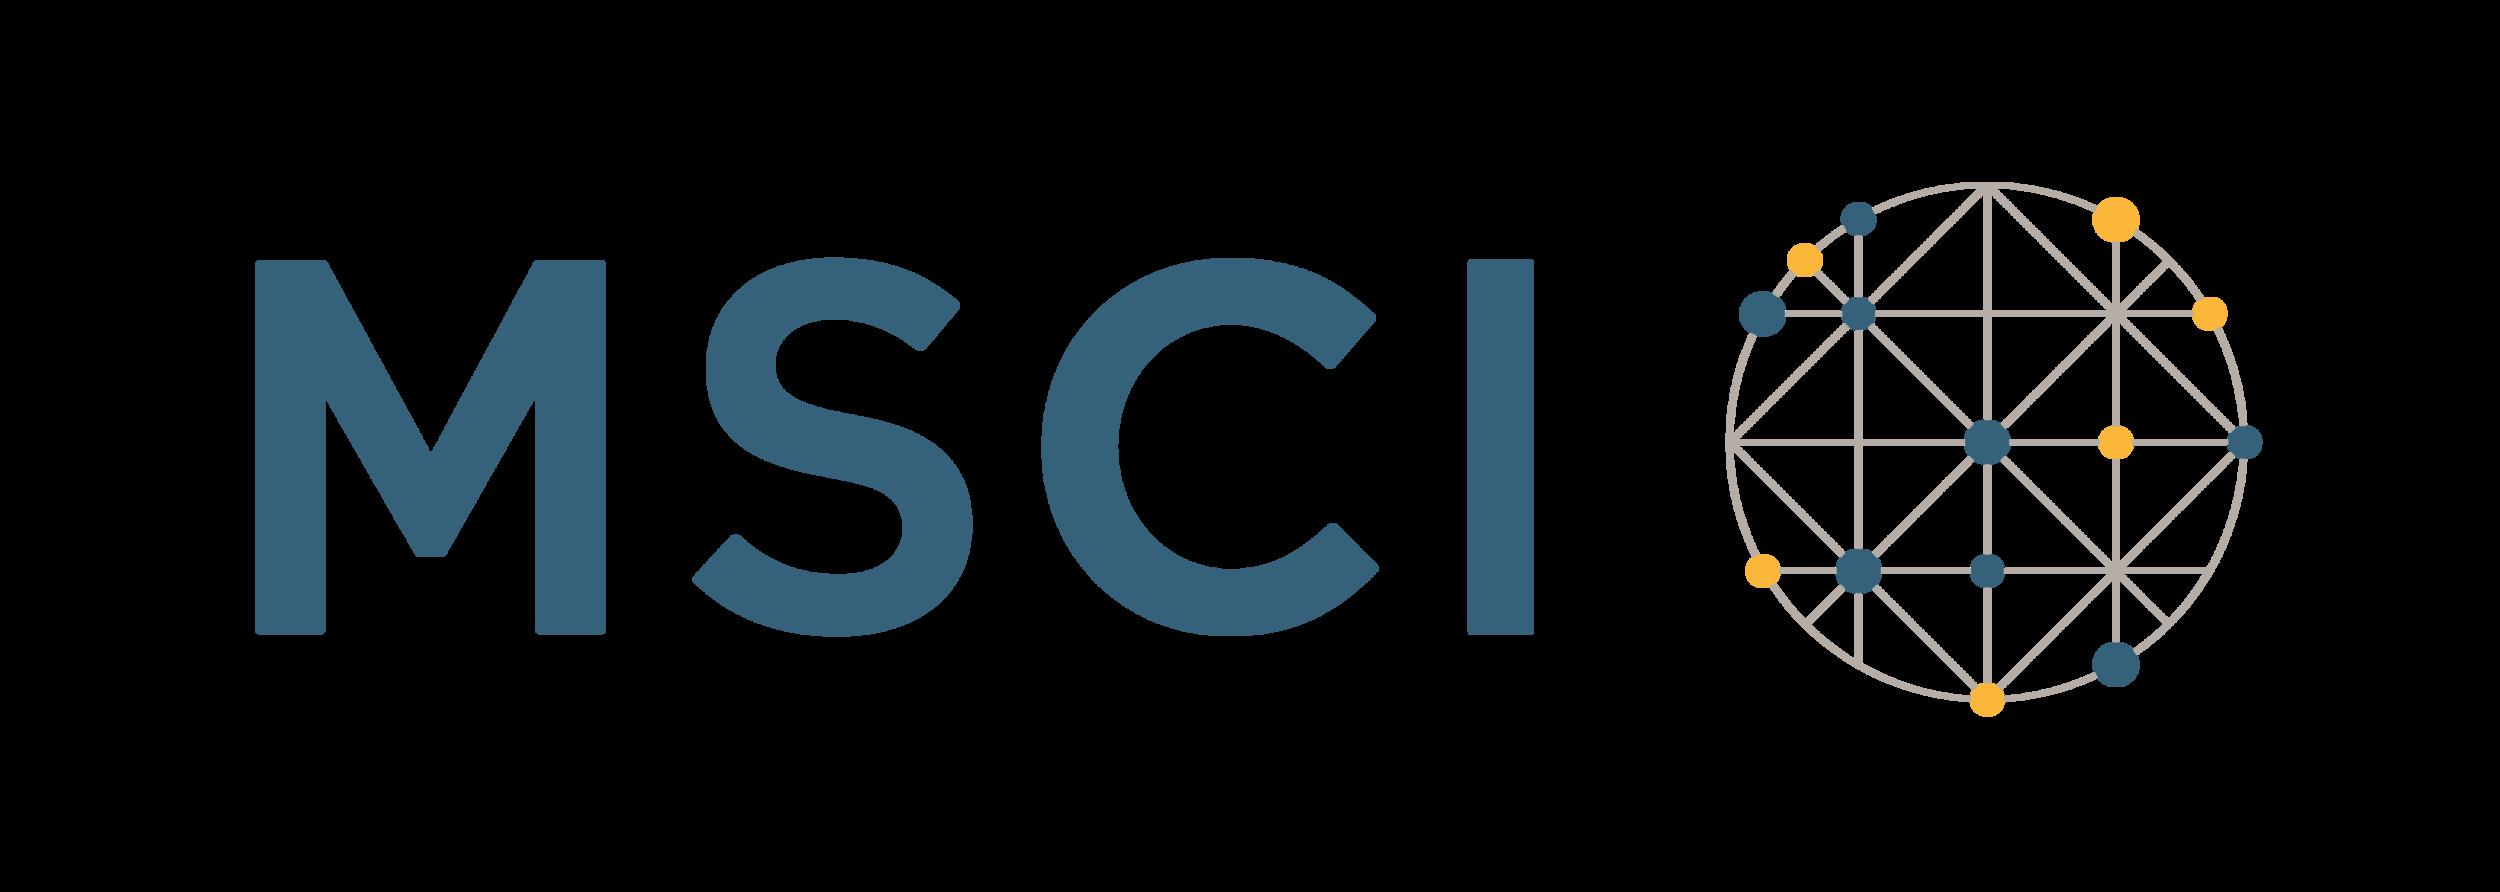 msci-logo-carousel-lg_new.png